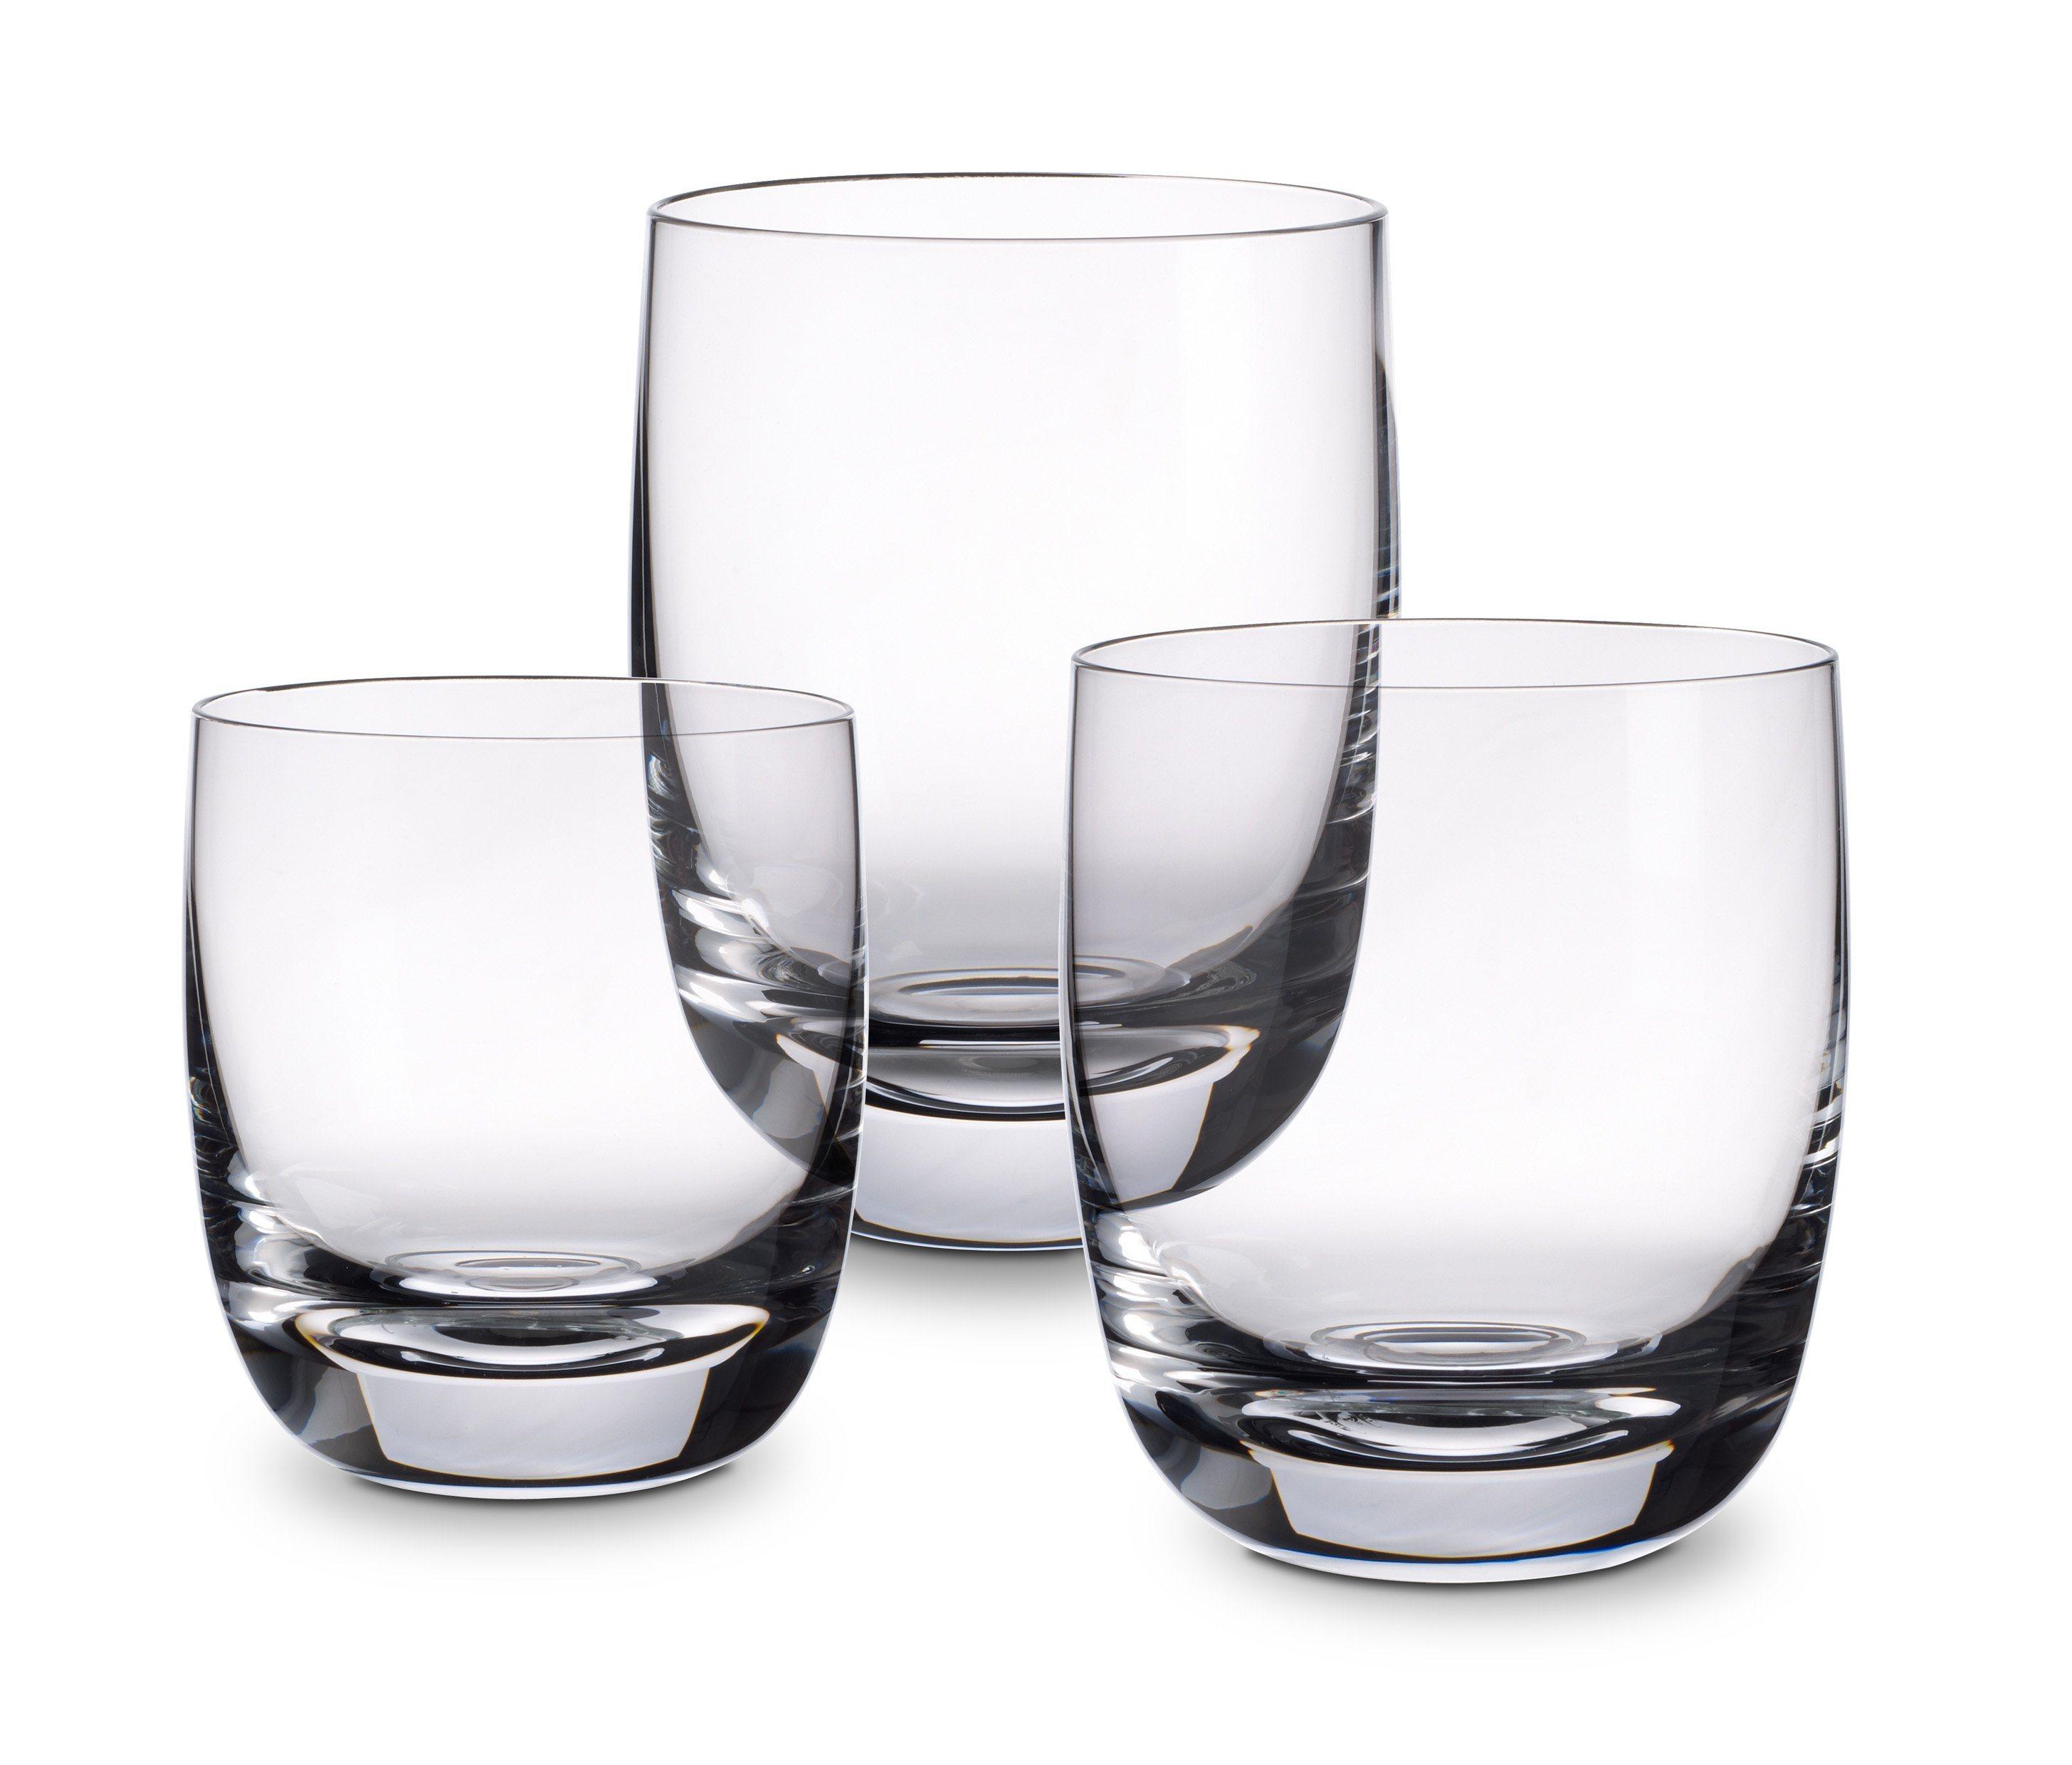 villeroy boch scotch whisky glas no 2 villeroy boch scotch whisky blended scotch online. Black Bedroom Furniture Sets. Home Design Ideas